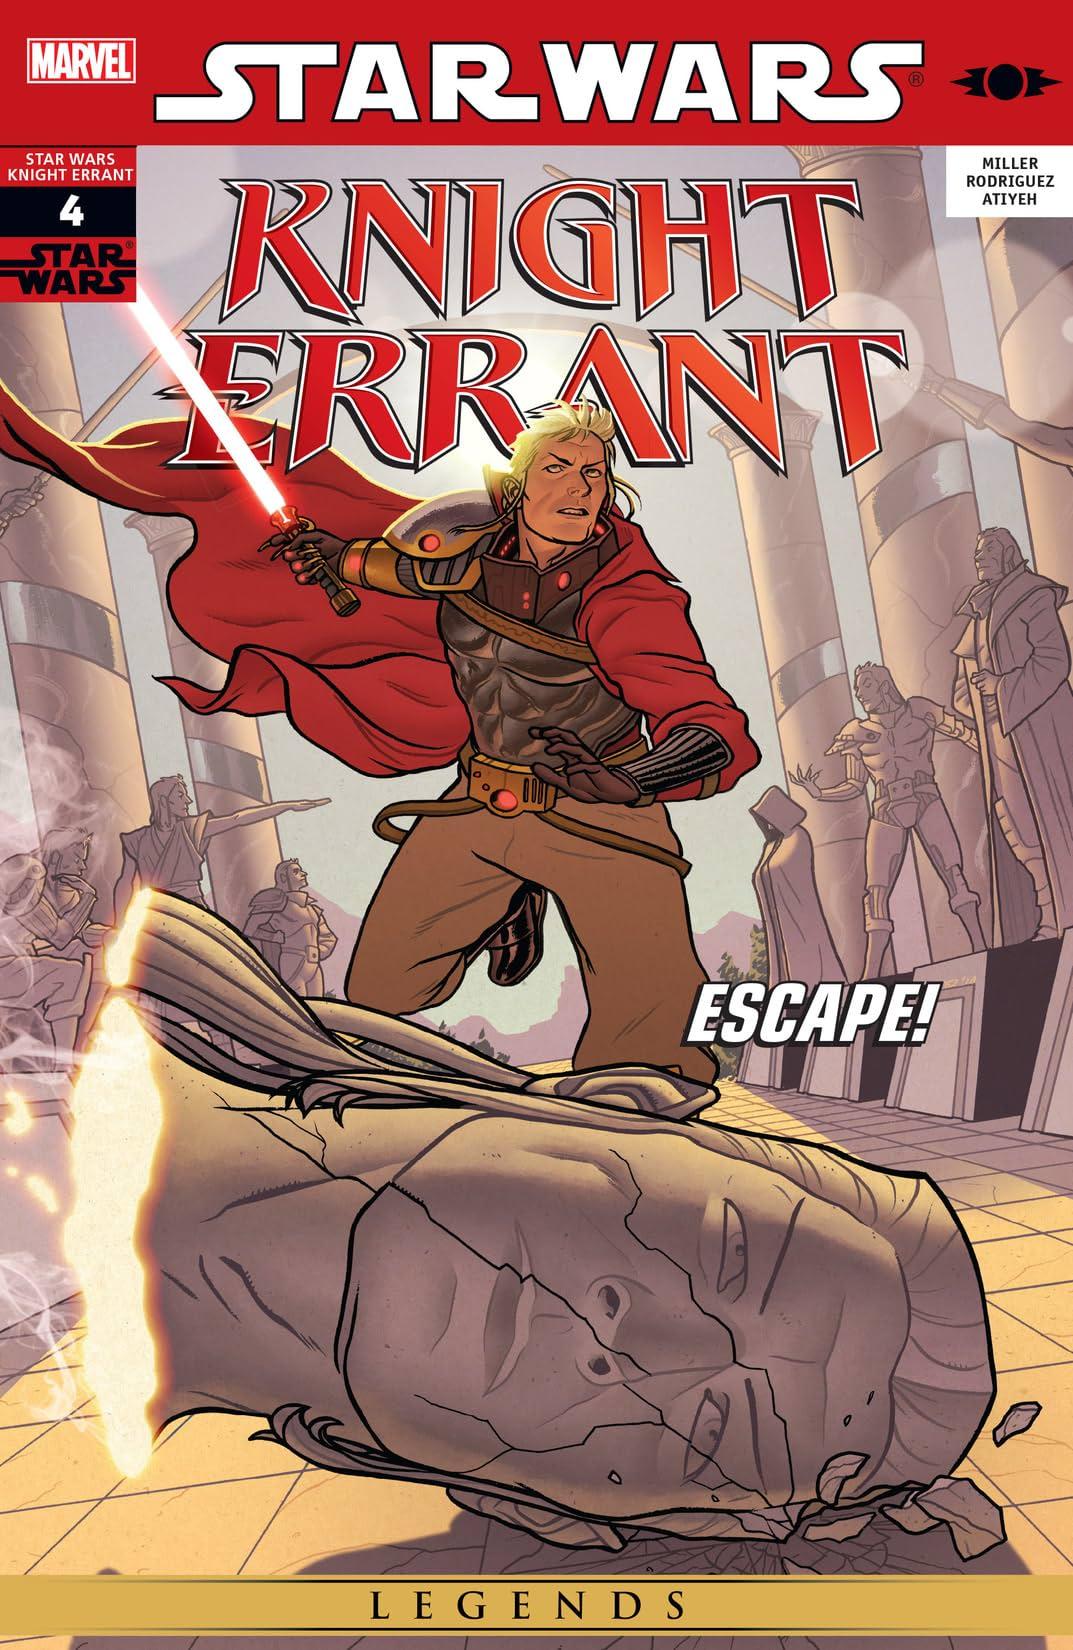 Star Wars: Knight Errant (2010-2011) #4 (of 5)